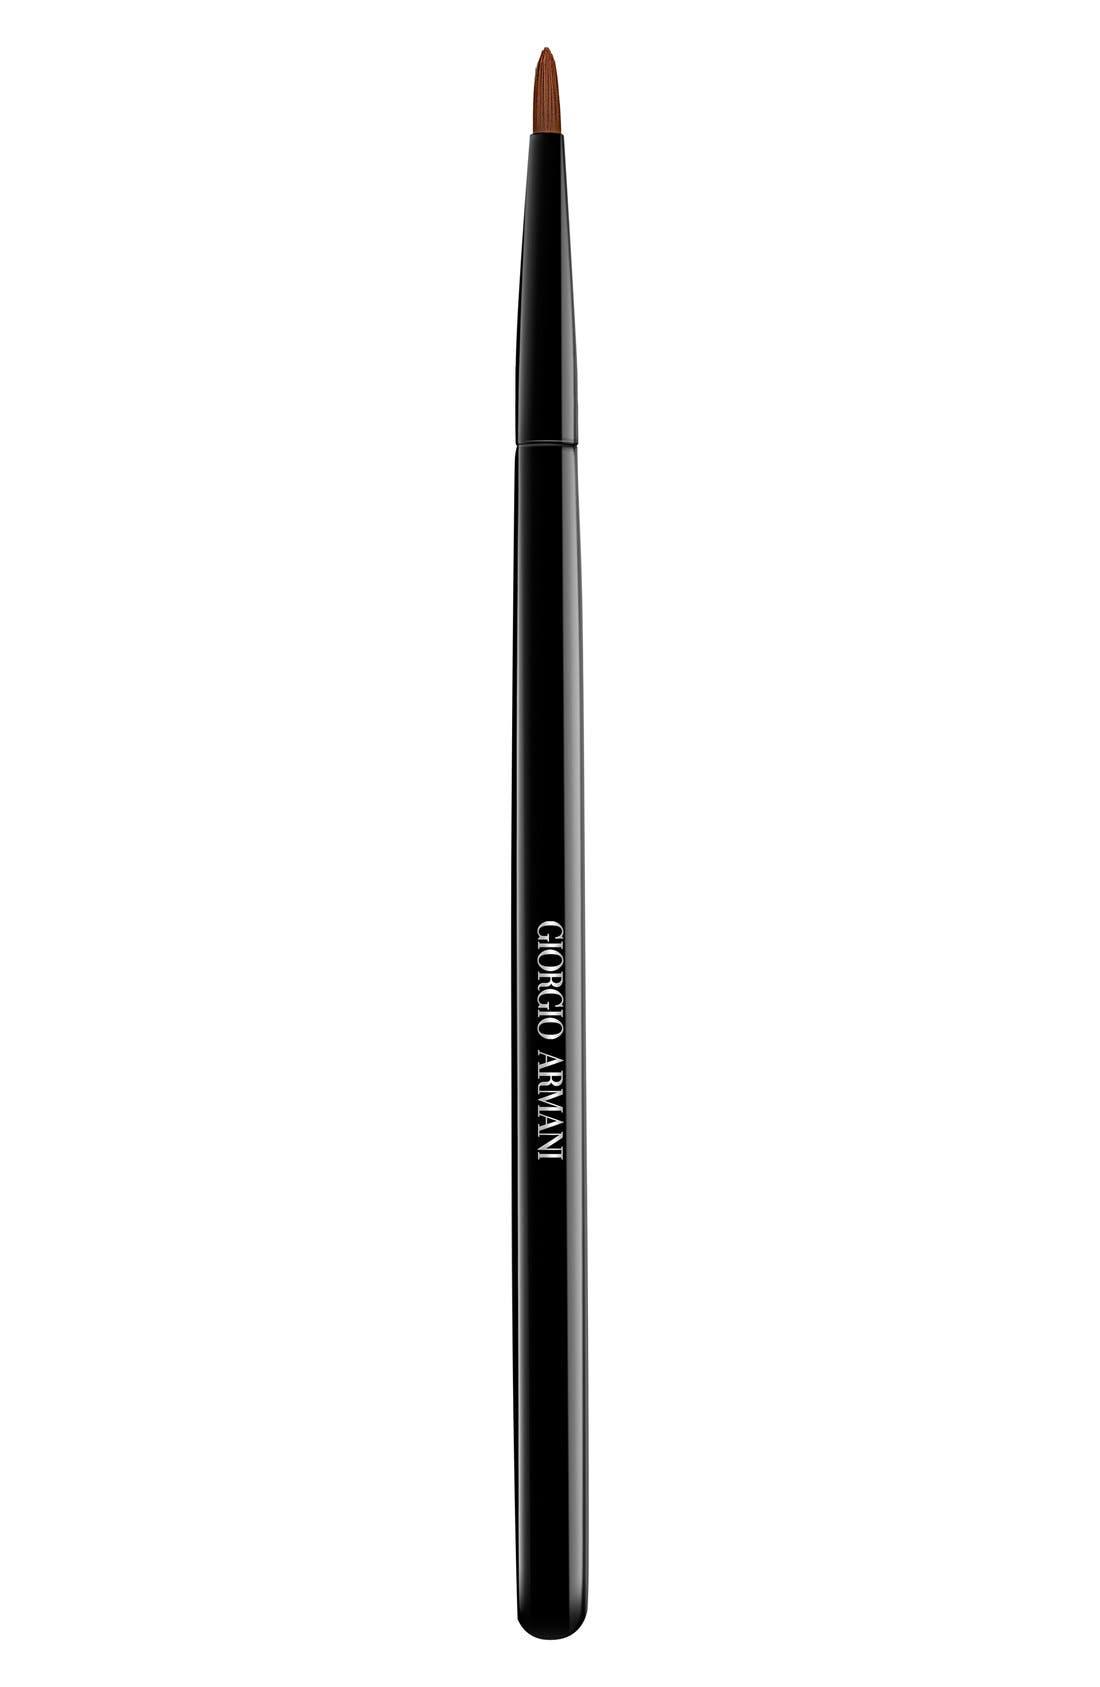 'Maestro' Eyeliner Brush,                             Main thumbnail 1, color,                             000